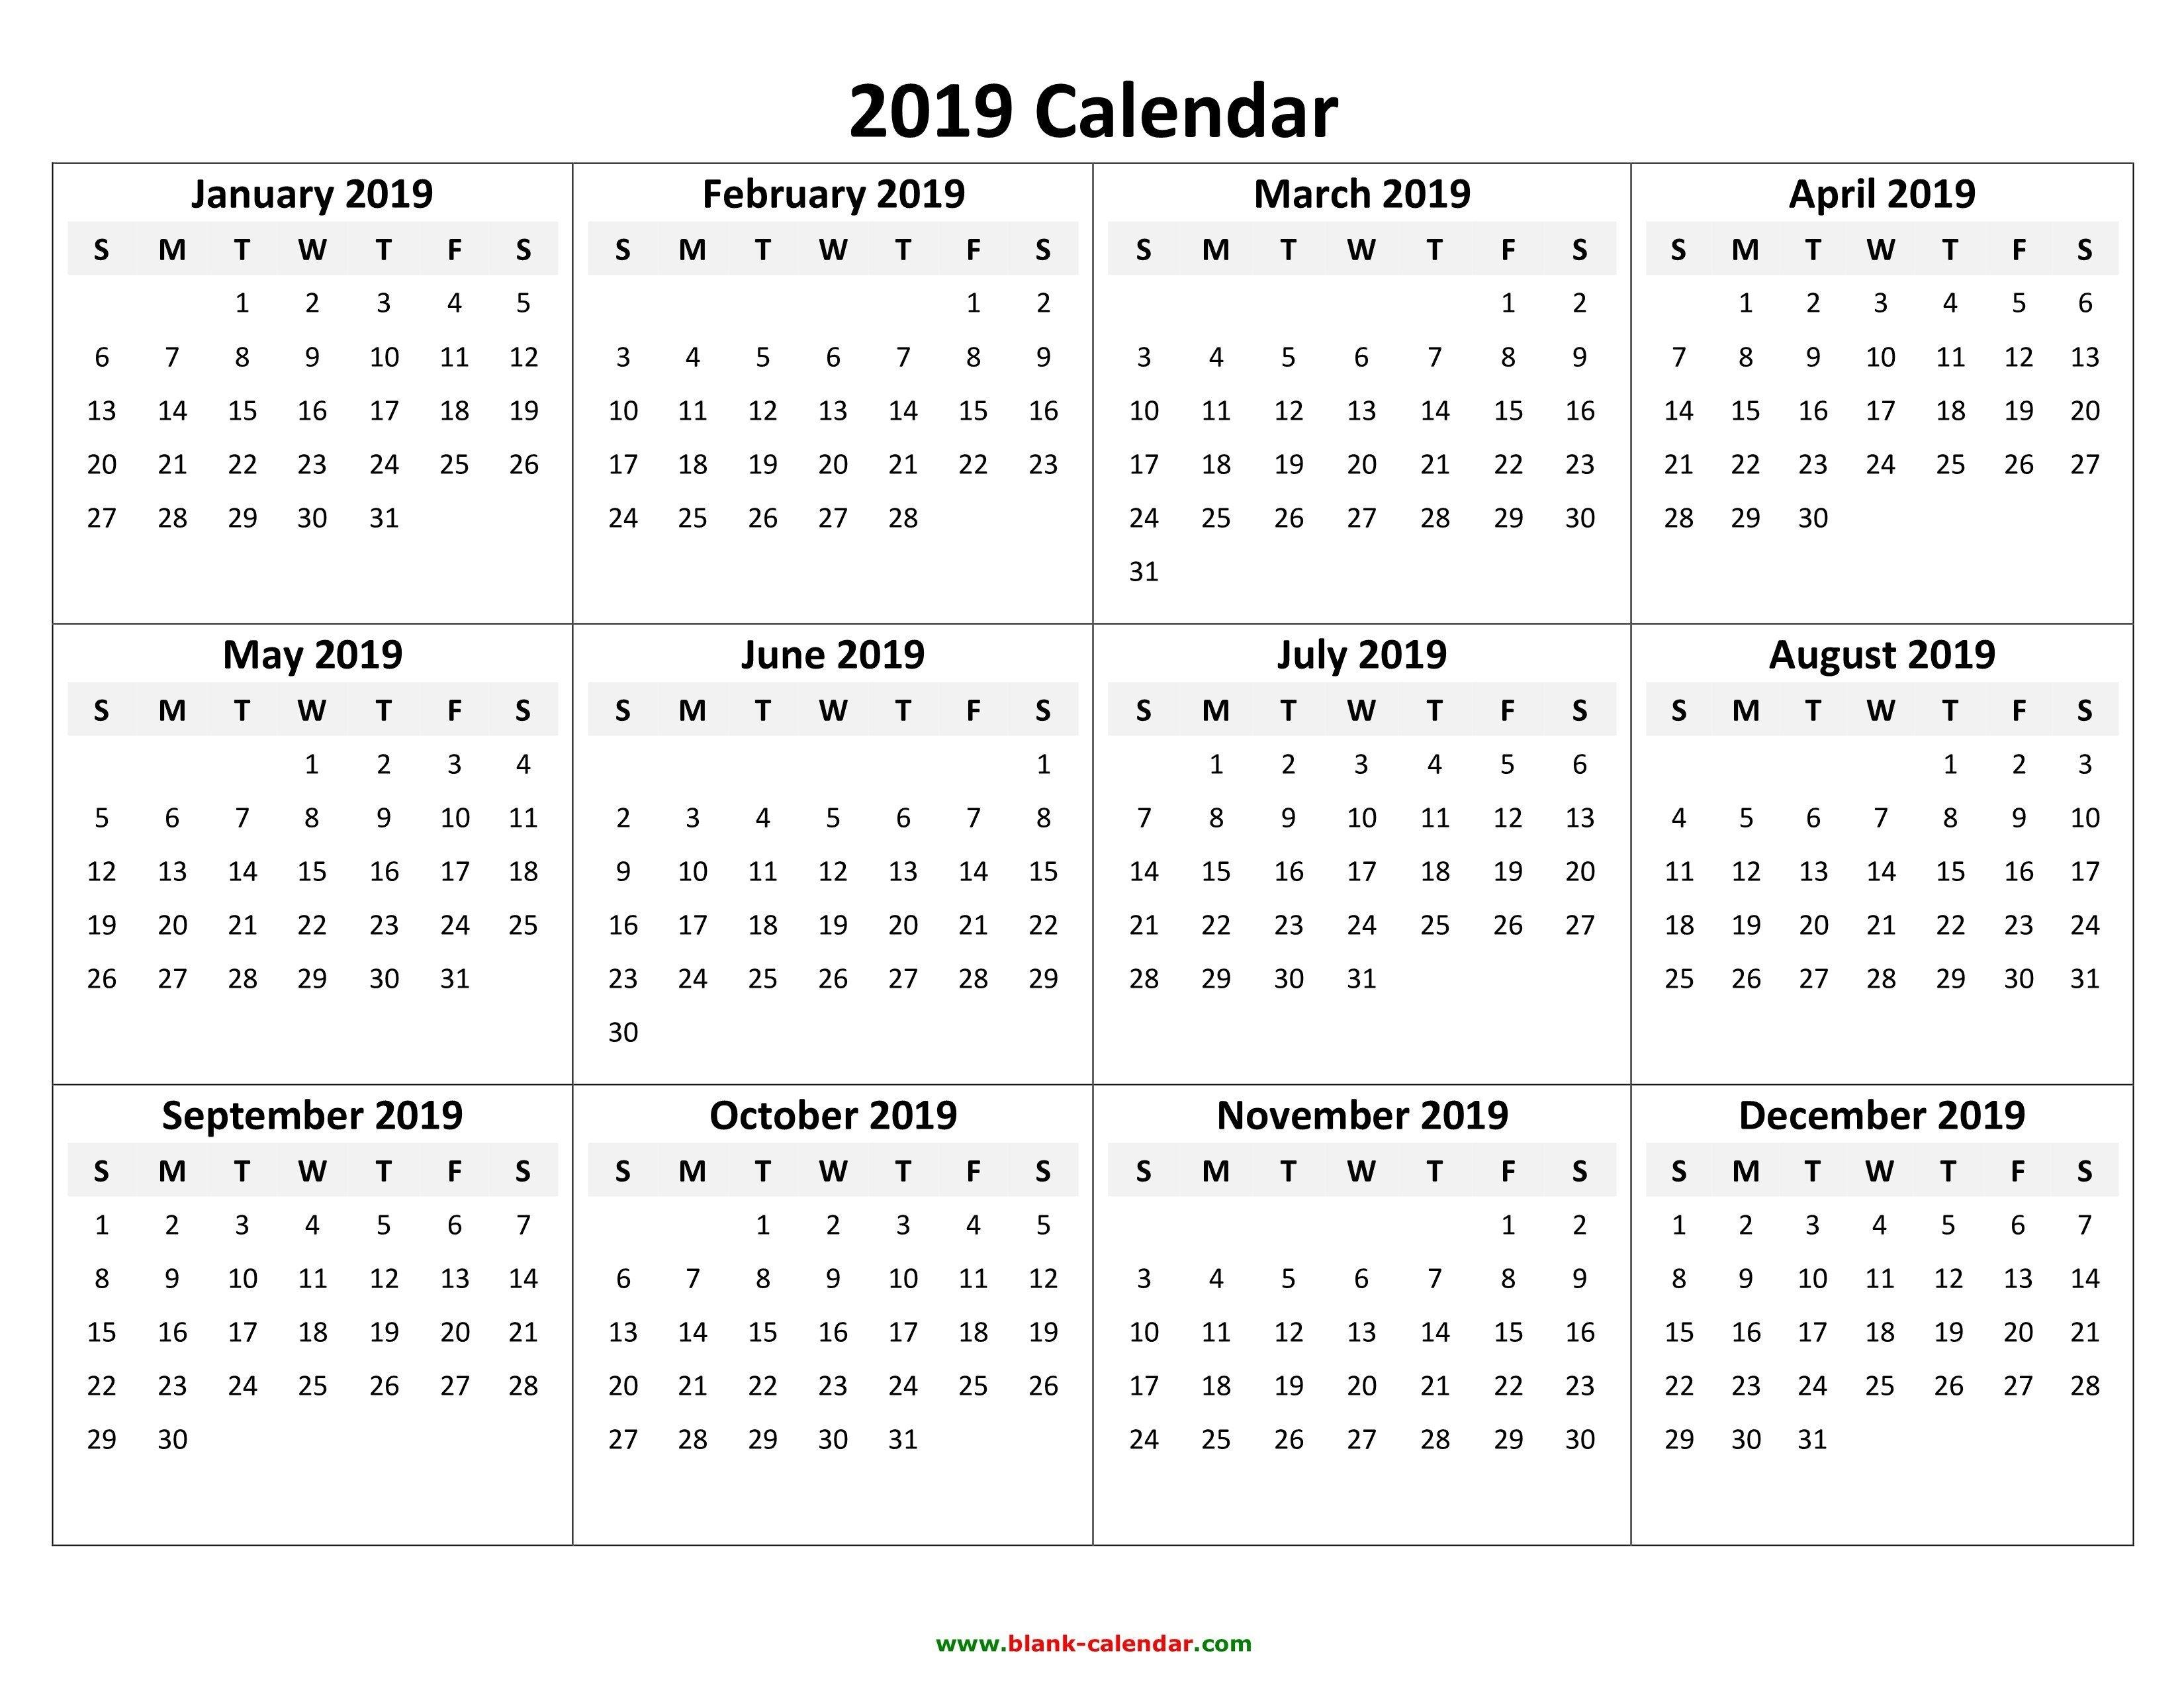 Calendar 2019 Xlsx At Seimado Calendar 2019 Xlsx